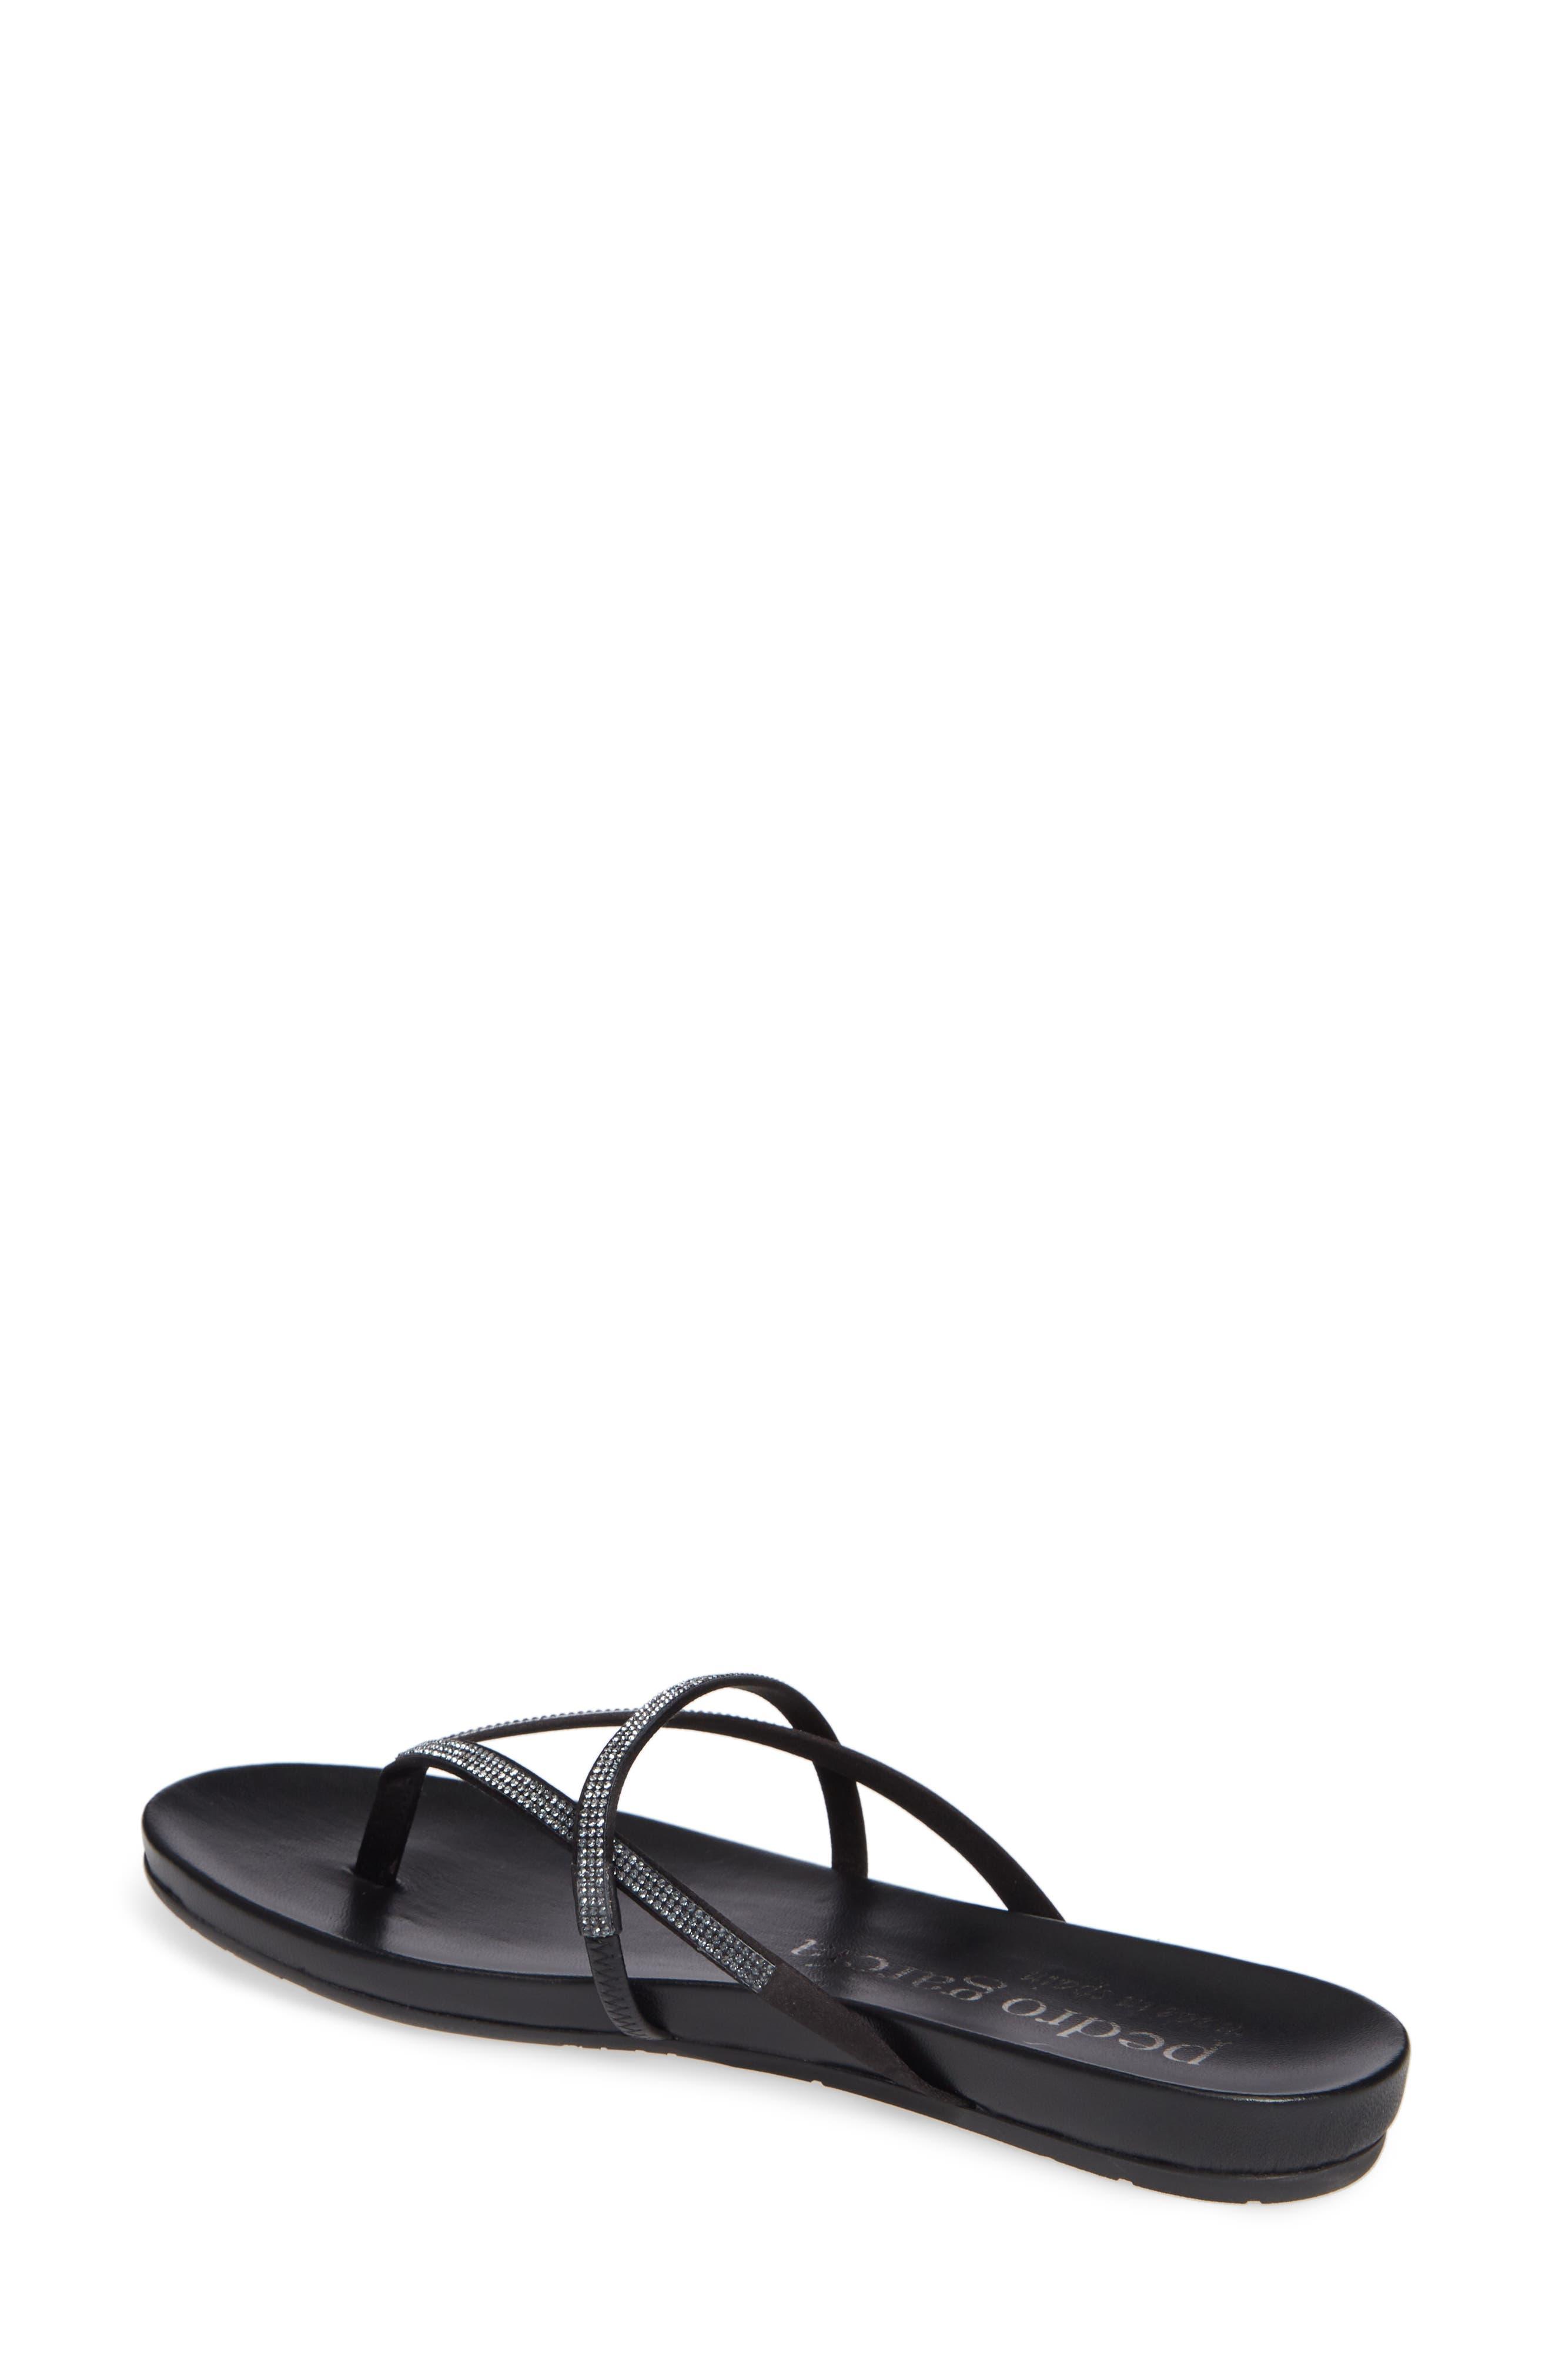 PEDRO GARCIA, Giulia Crystal Embellished Sandal, Alternate thumbnail 2, color, METEORITE SATIN